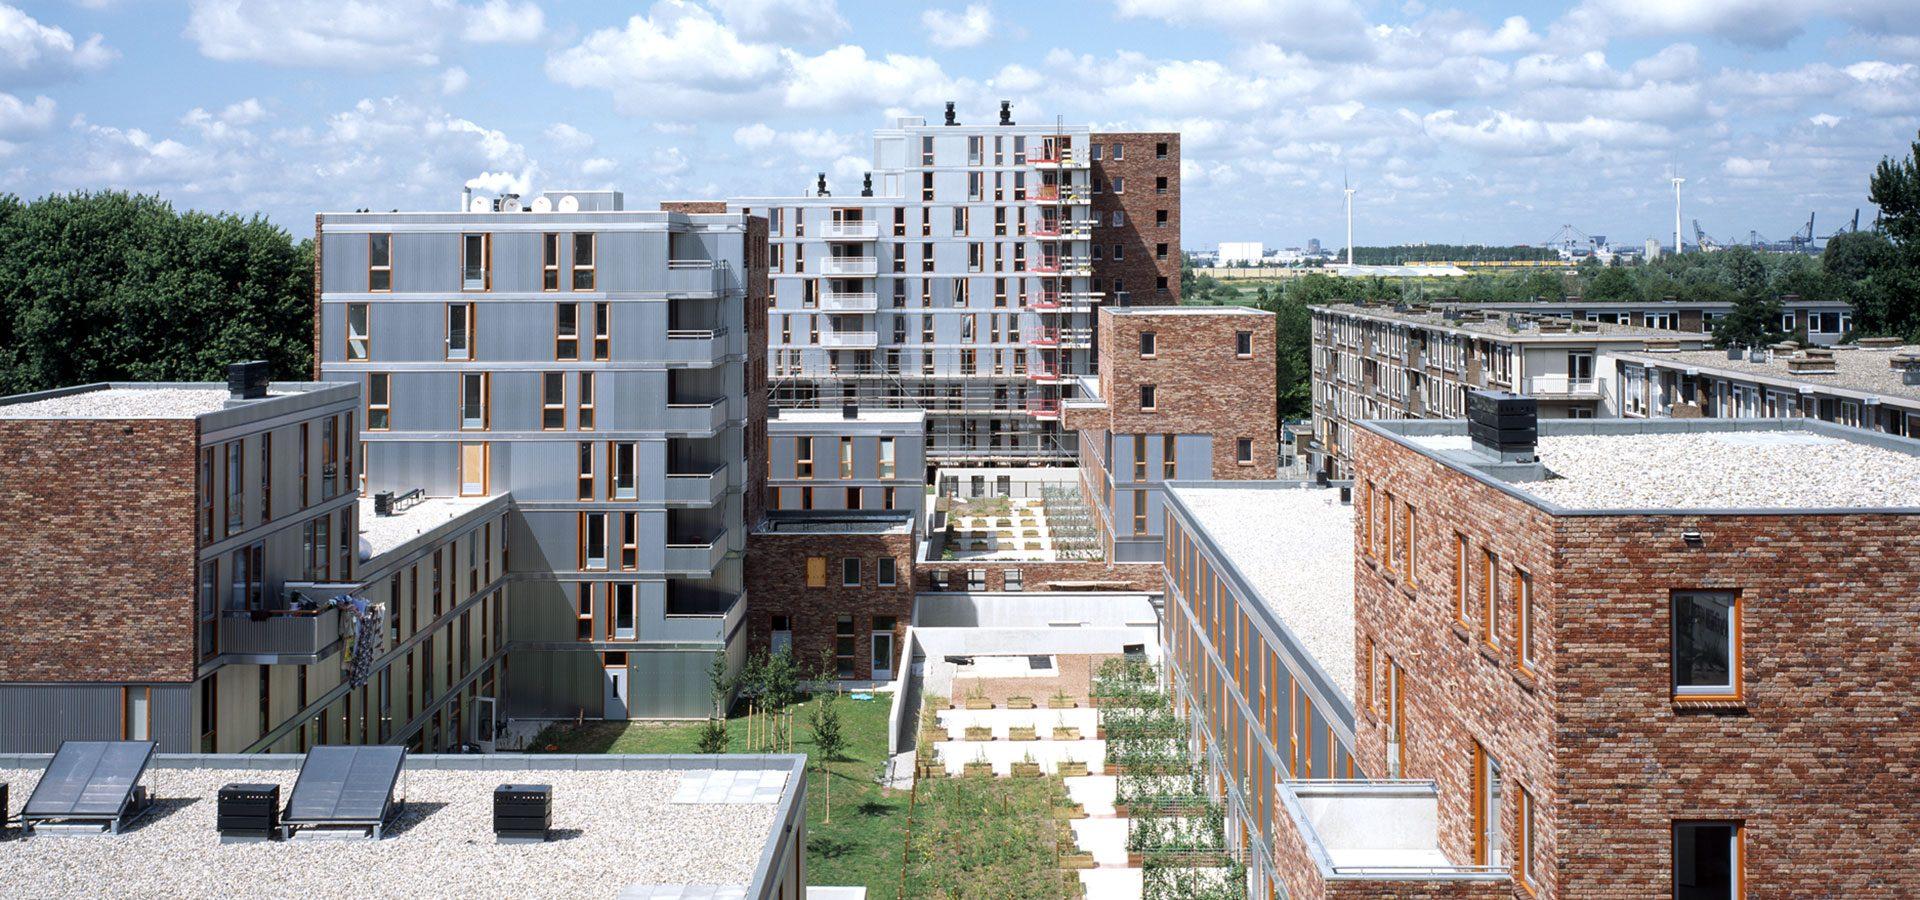 FARO architecten Geuzentuinen Amsterdam 02